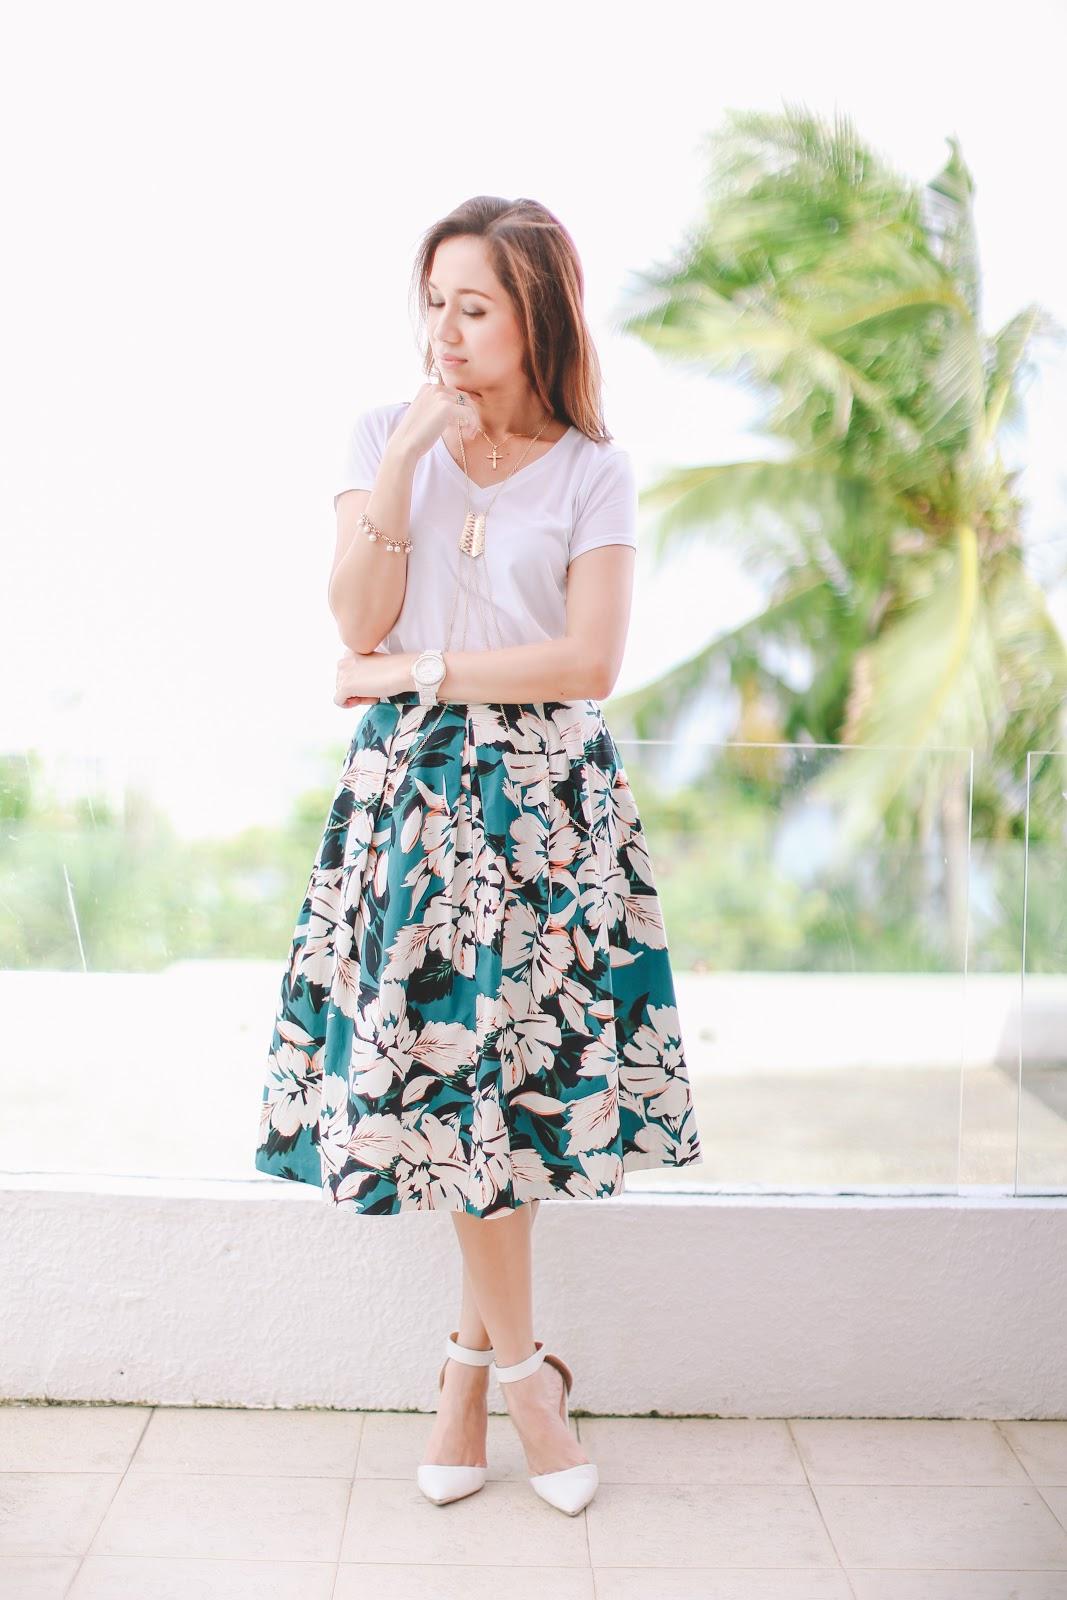 Bank on Basics, Blinkbox Photos, Cebu Fashion Blogger, Giordano Philippines, Movenpick Hotel Mactan Island Cebu, OUTFIT OF THE DAY, Toni Pino-Oca, Fashion, How to wear a white shirt, full skirt